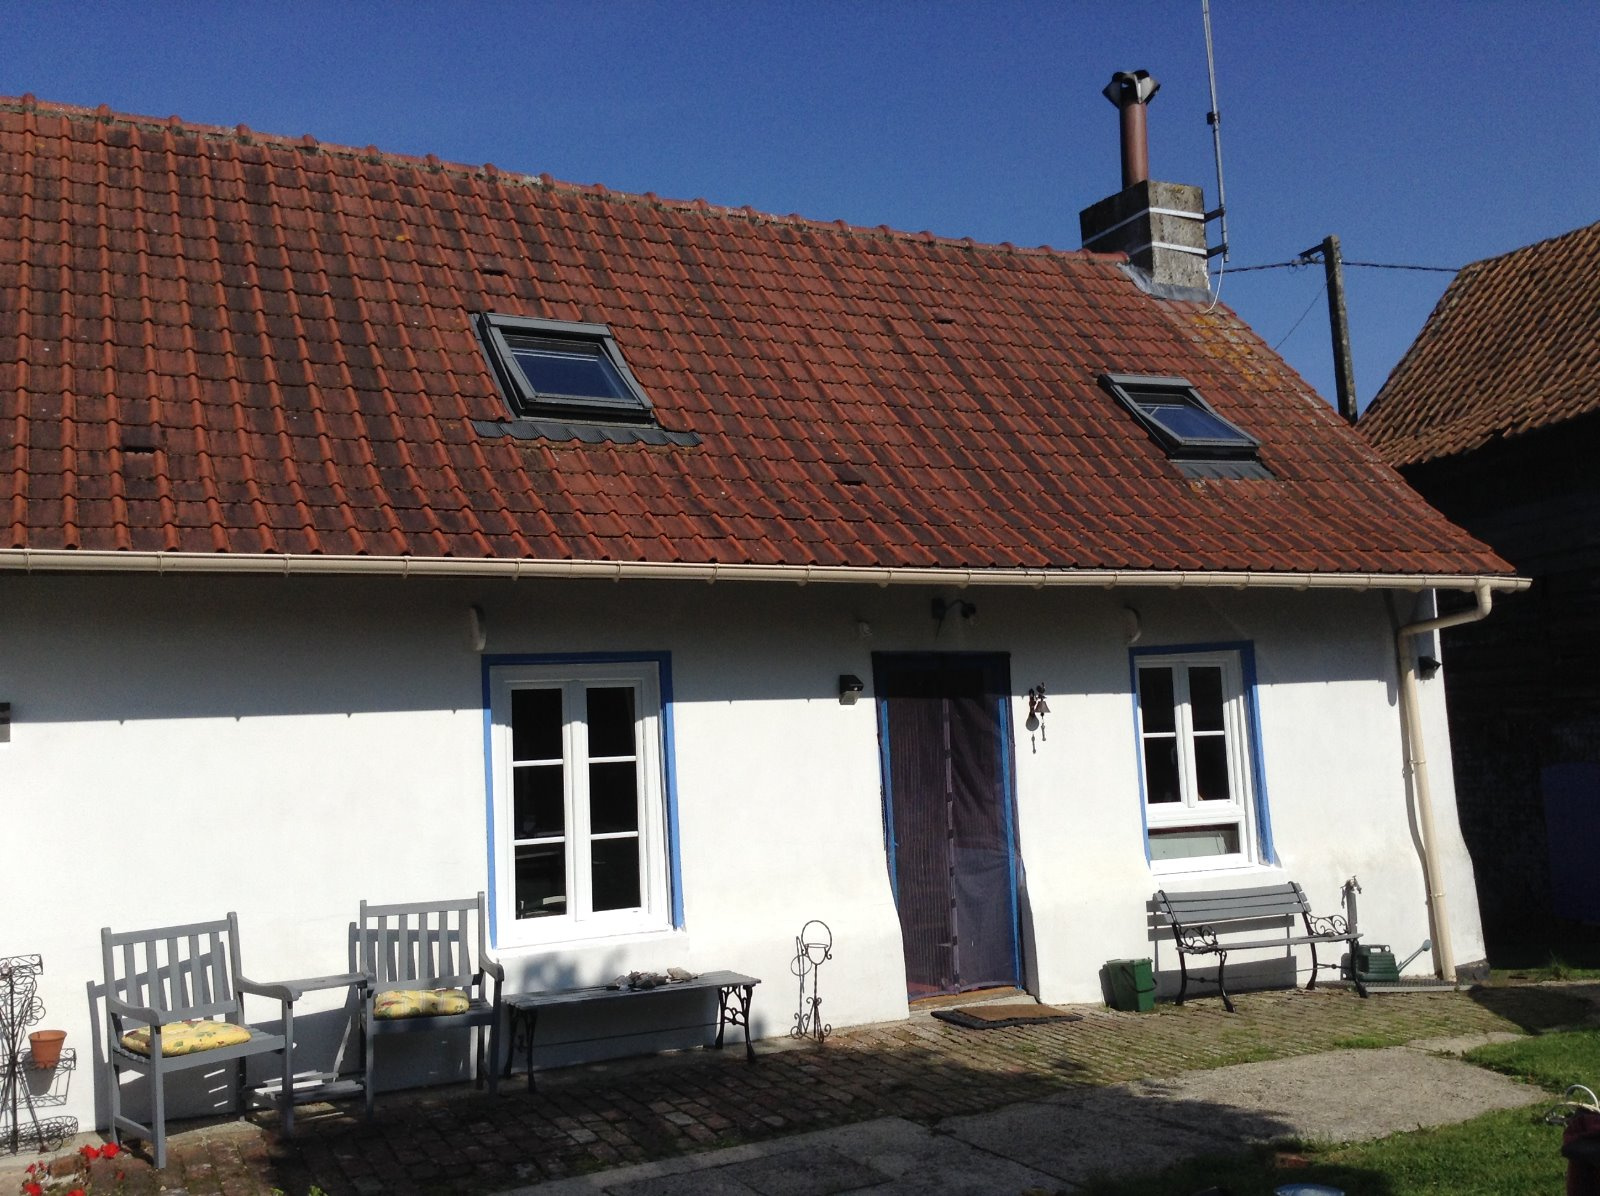 Vente maison/villa 5 pièces rumilly 62650